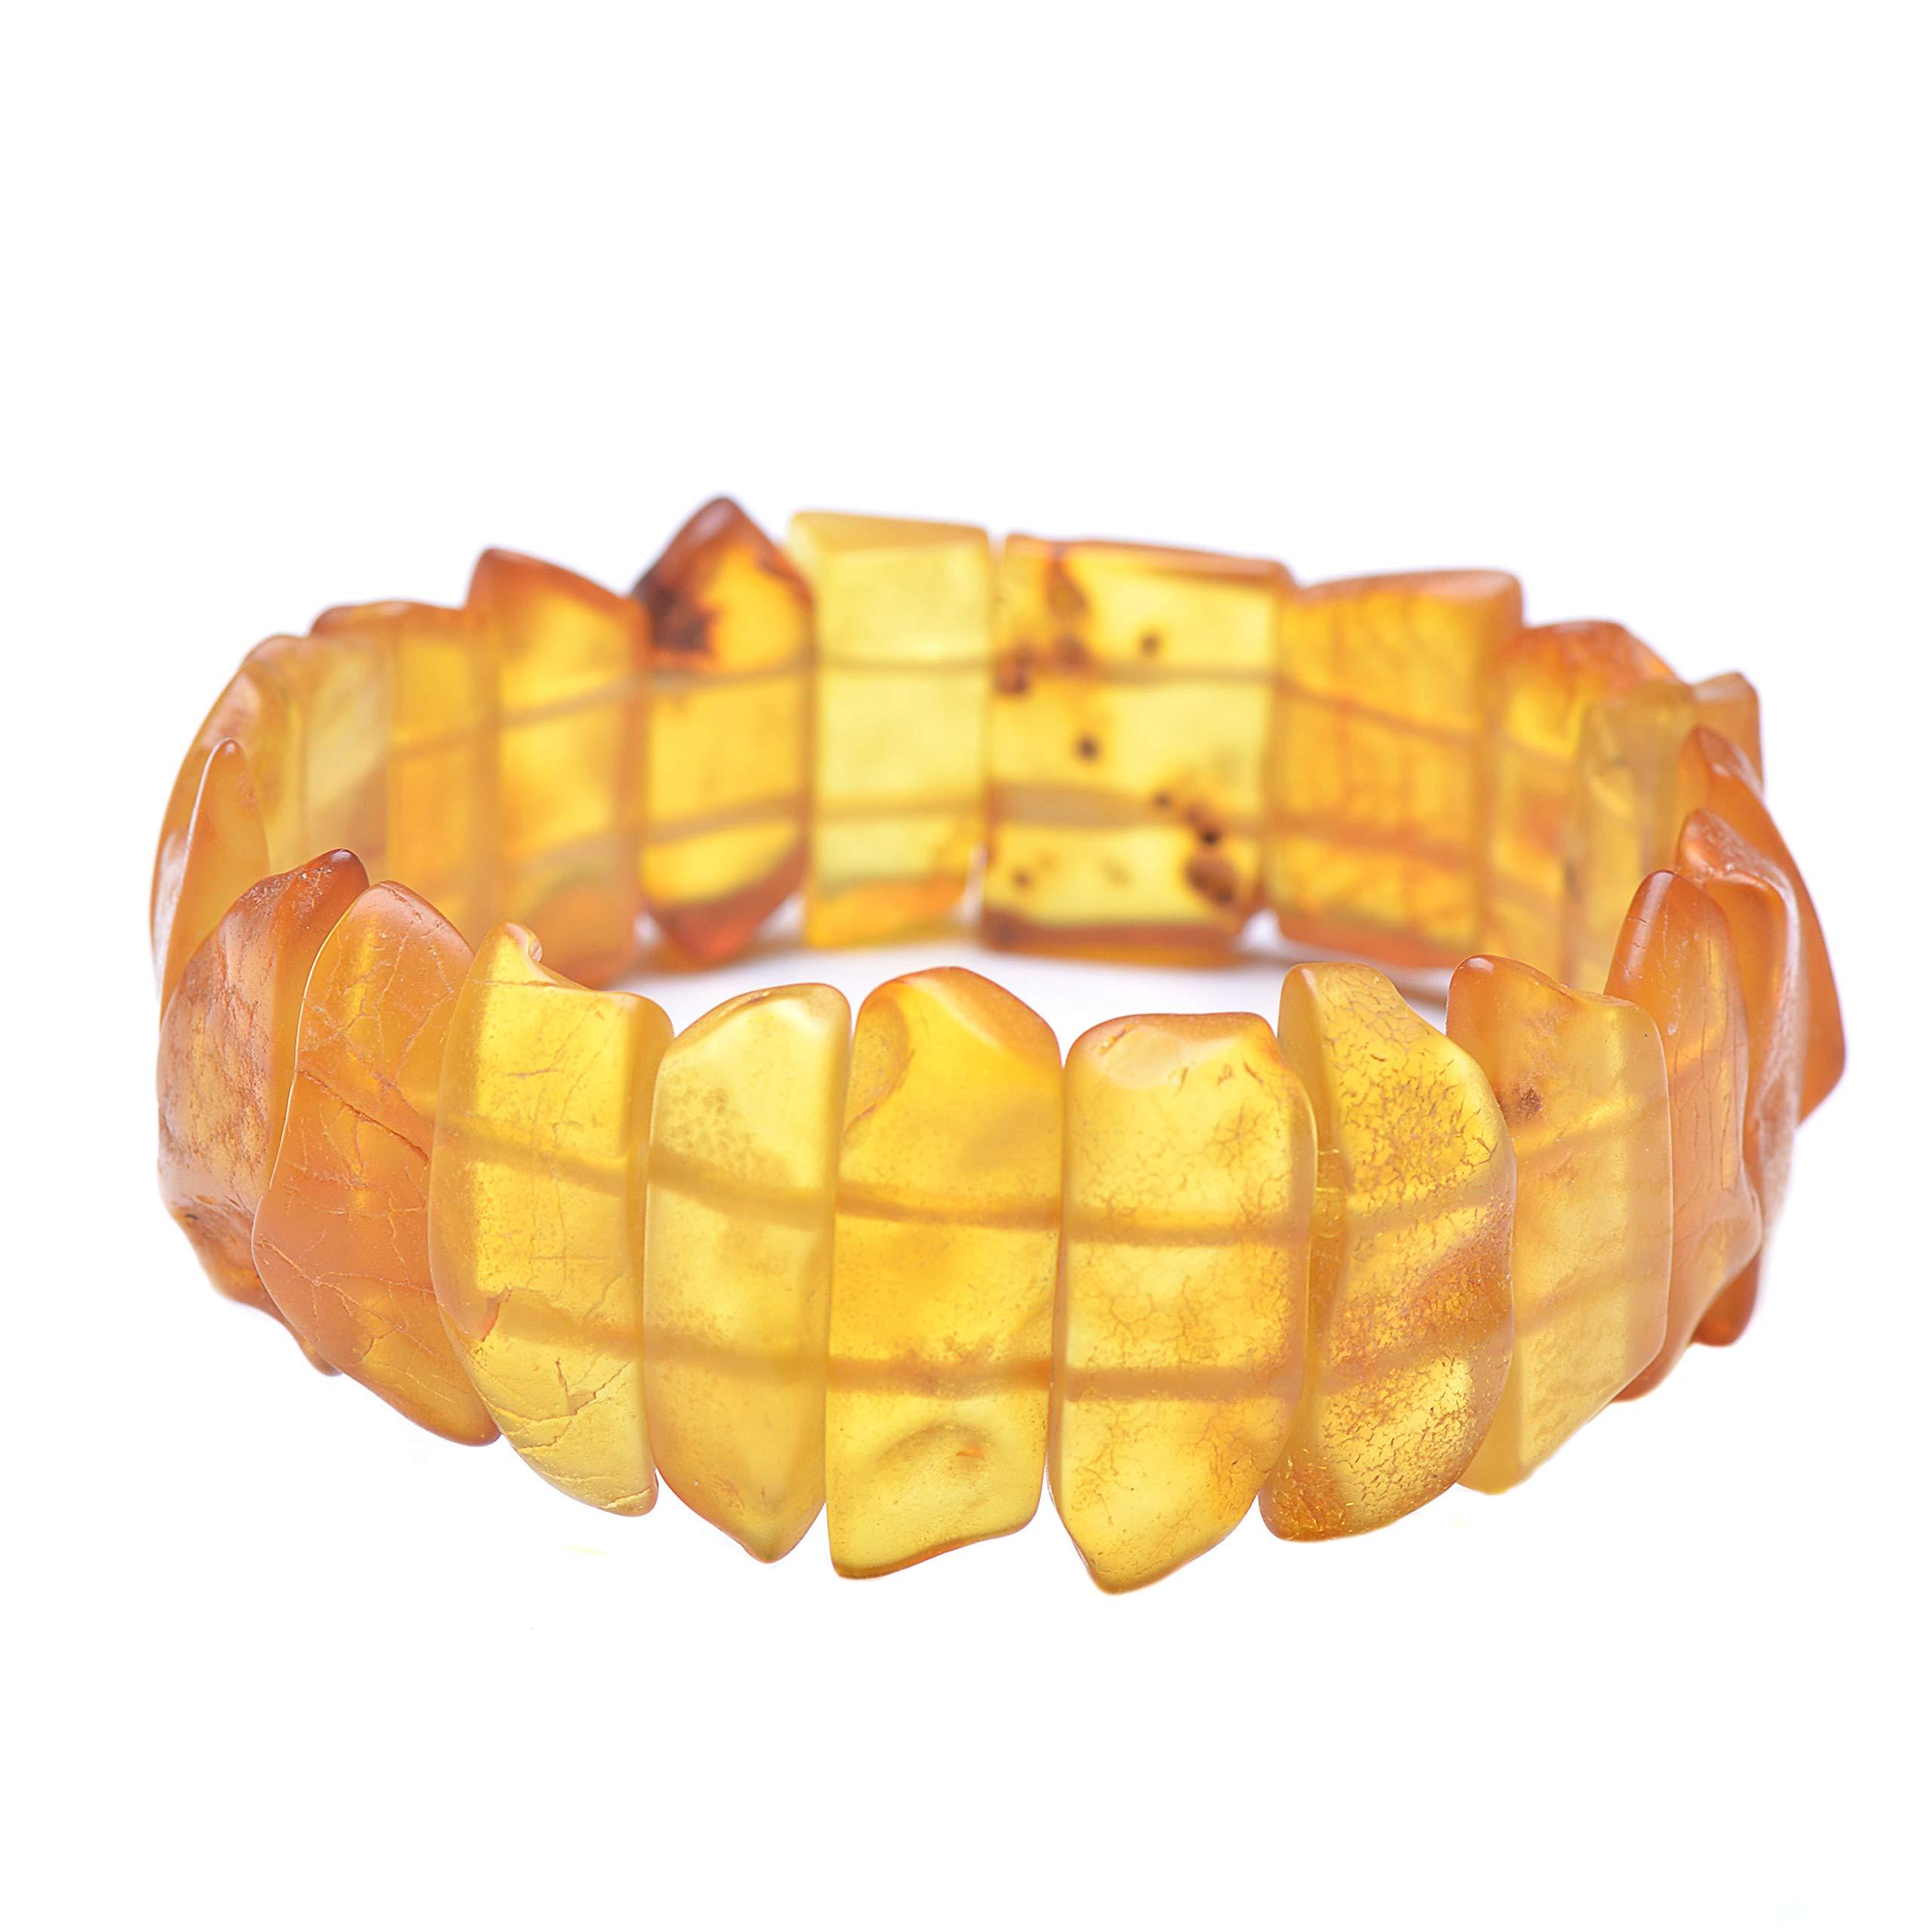 Amber Bracelet - Unique Amber Bracelet - Handmade Amber Jewelry - Baltic Amber Bracelet by Genuine Amber (Image #2)